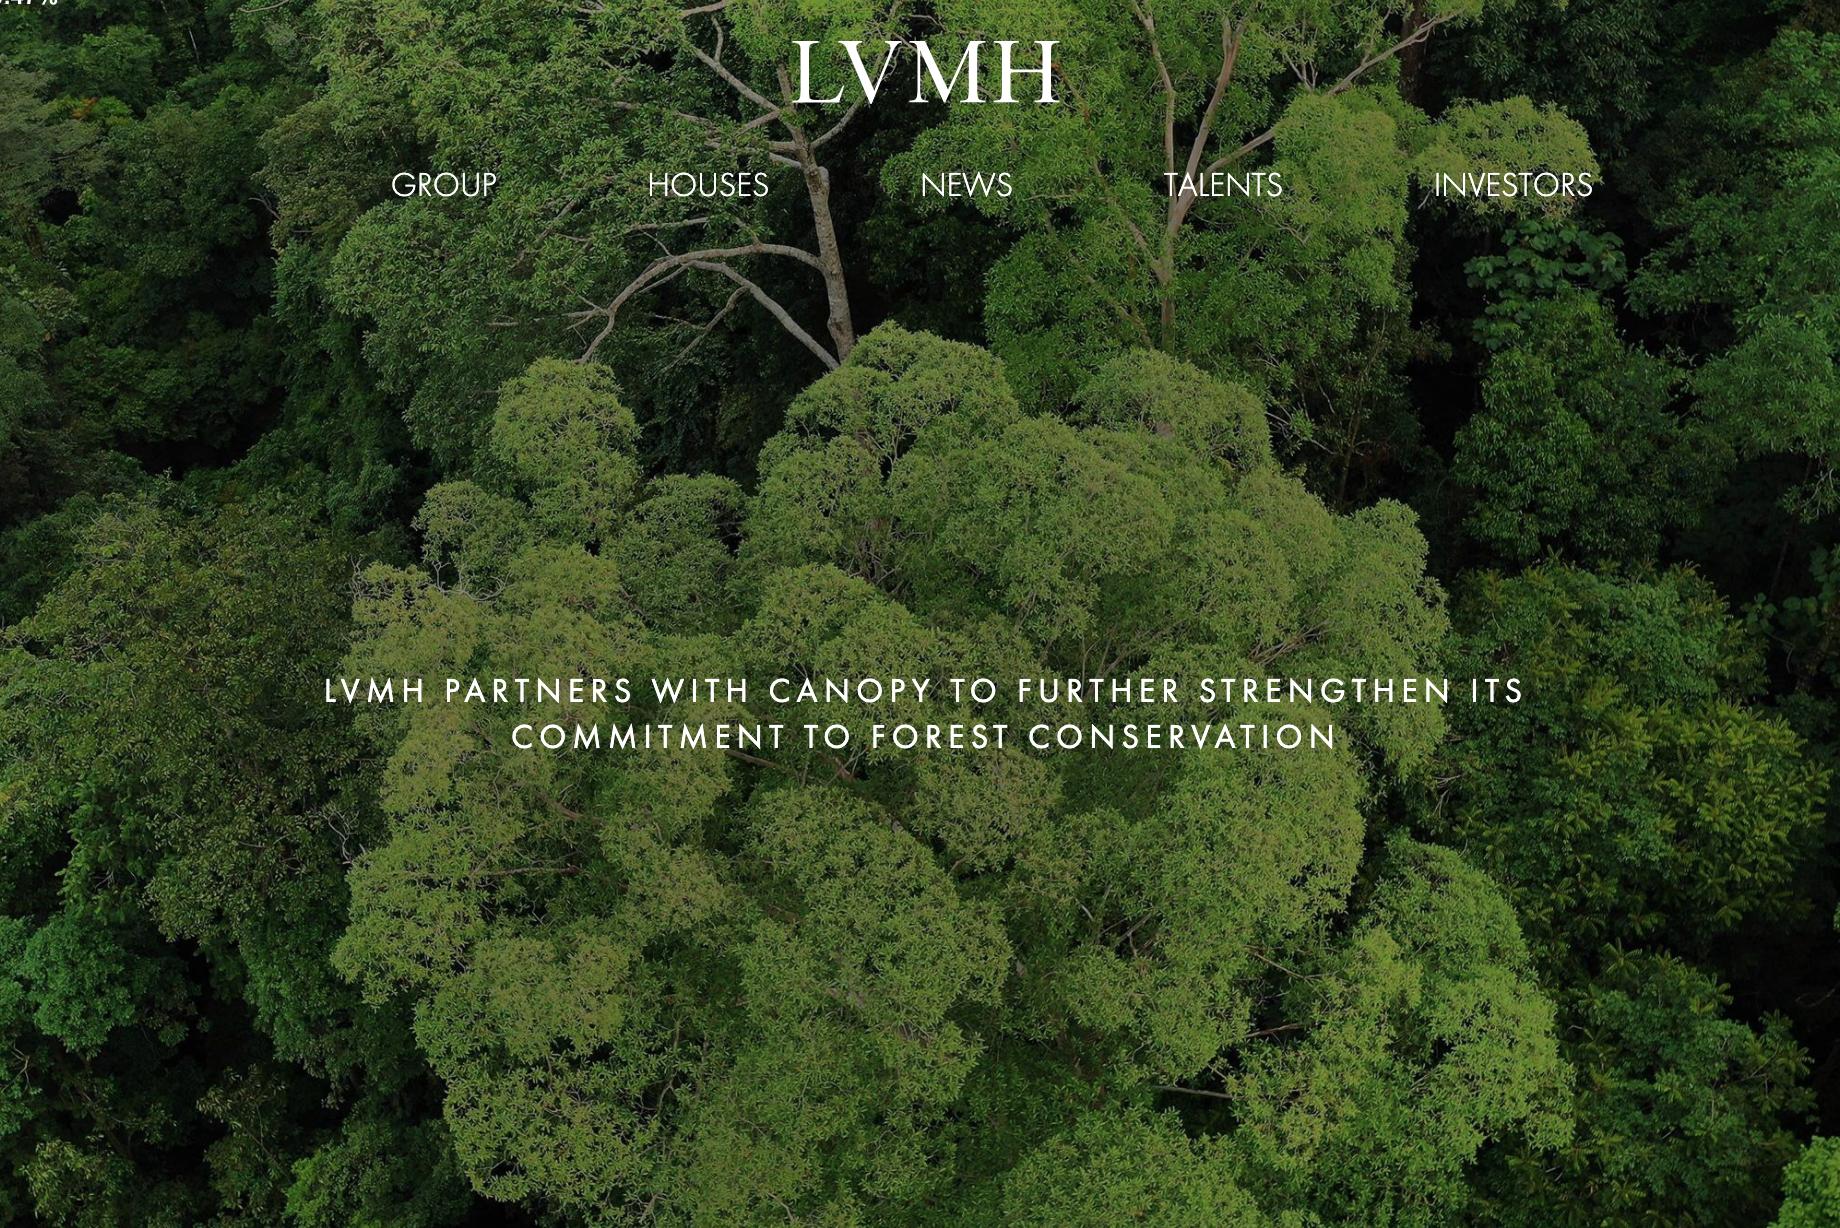 LVMH 与非营利环保组织Canopy 展开合作,推进环保包装,保护森林资源